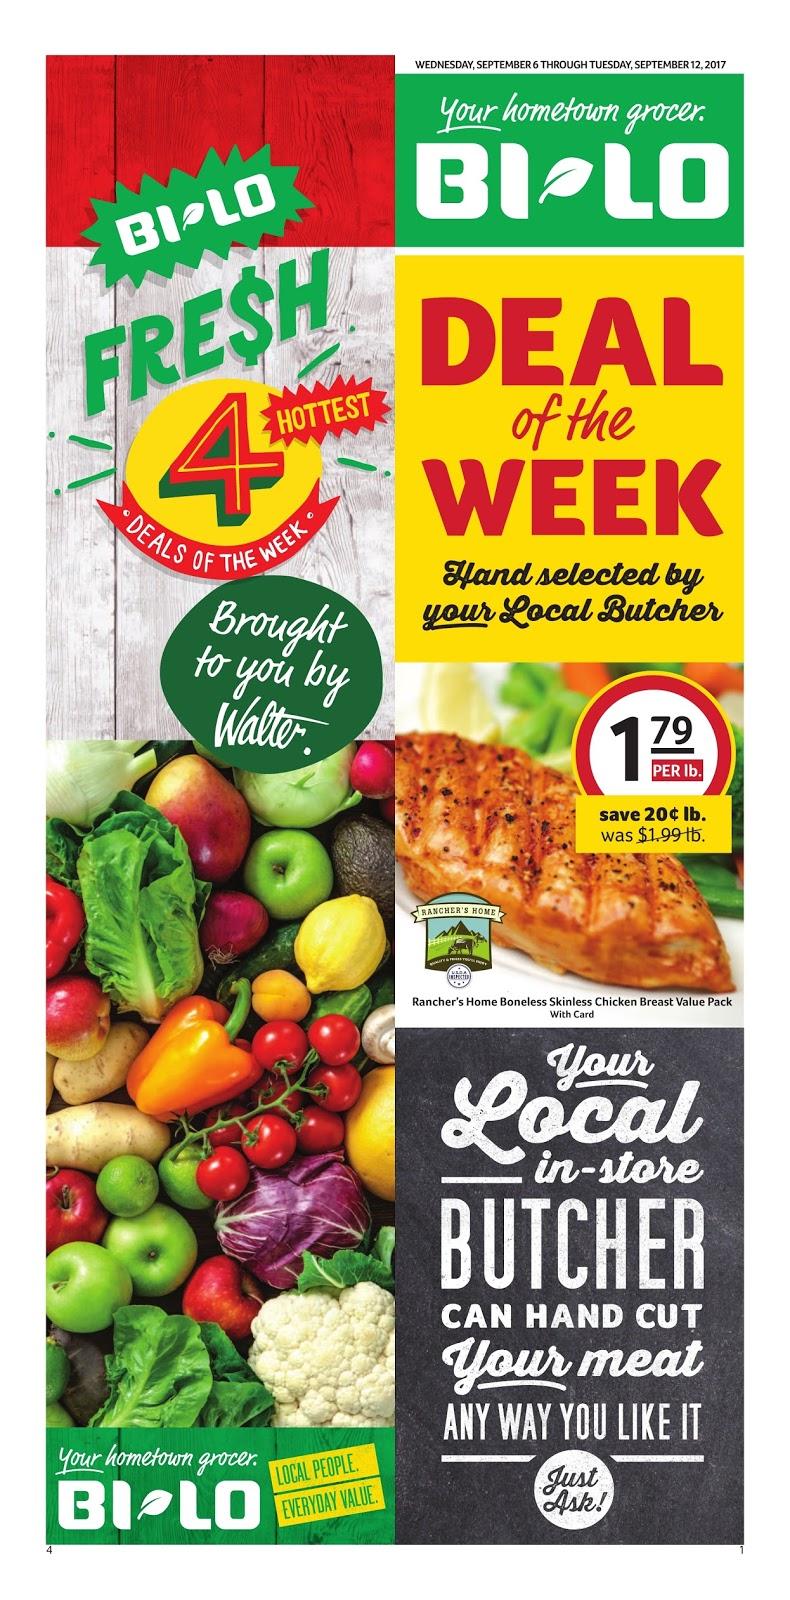 Bilo Weekly Ad Spartanburg SC Daily Saving Deals